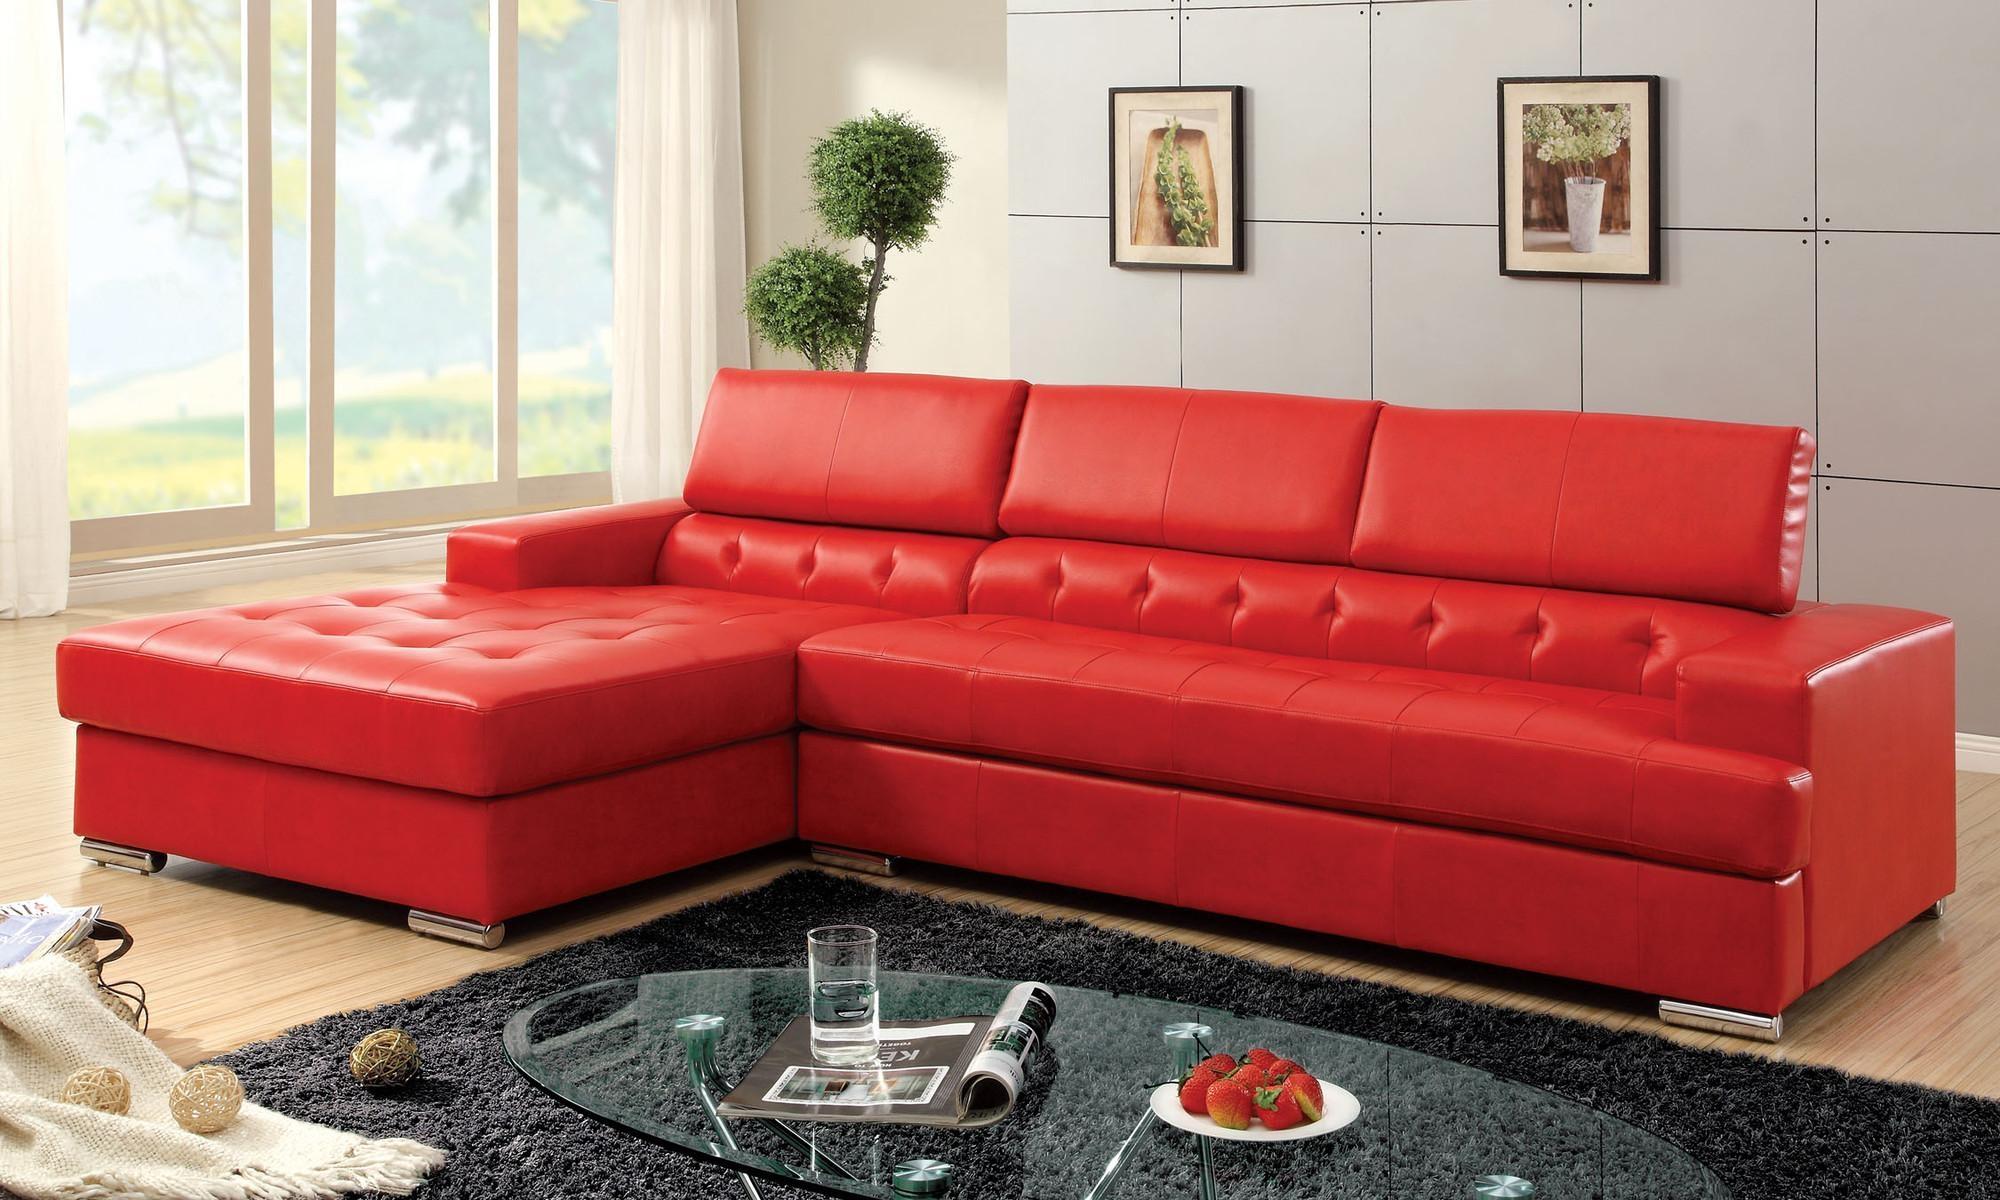 Deep Red Leather Sofa | Tehranmix Decoration Regarding Dark Red Leather Sofas (View 6 of 20)